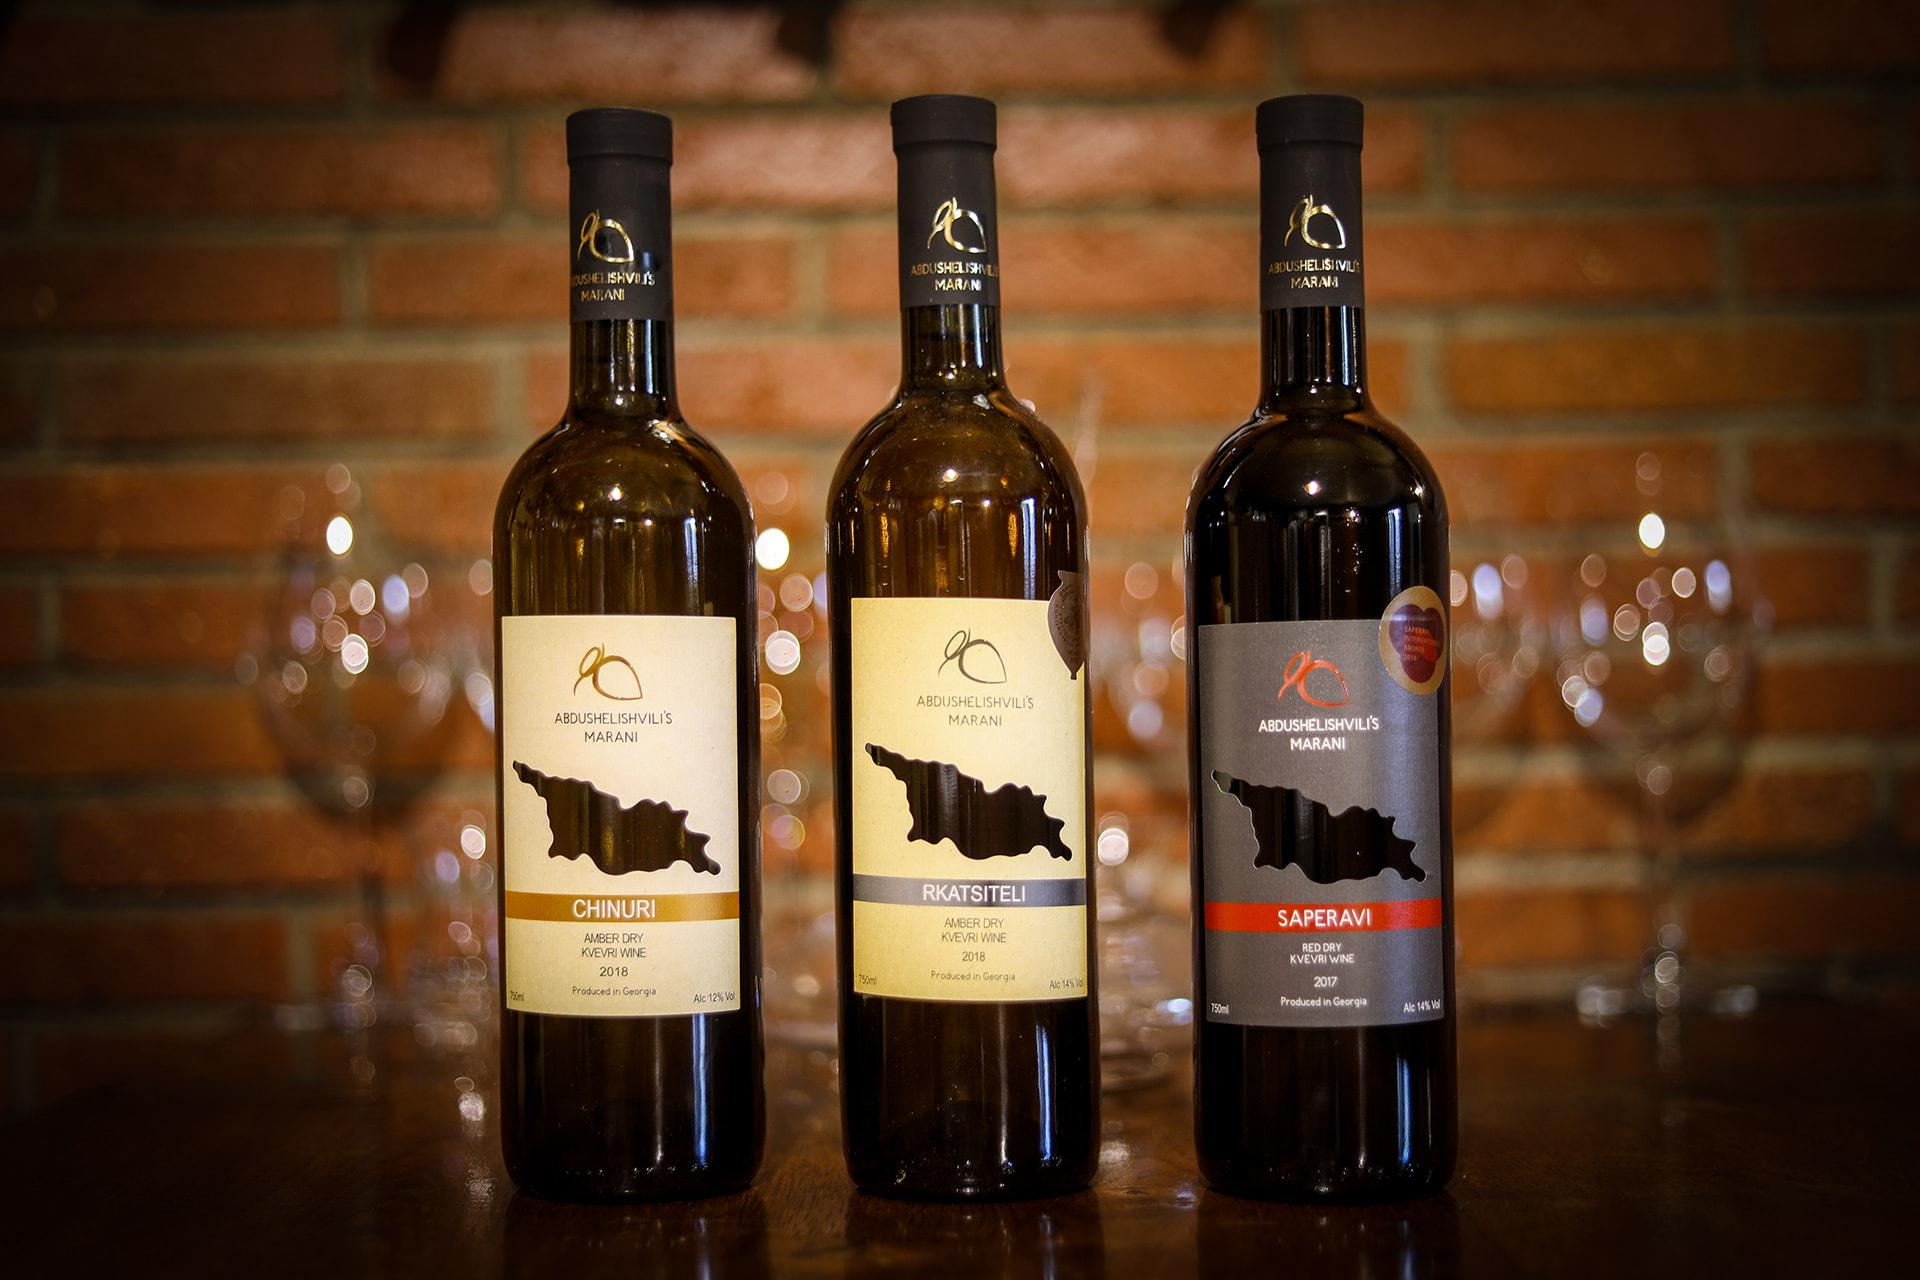 Abdushelishvili Winery Wijn proefpakket Abdushelishvili, droge amber en rode wijnen (6x)